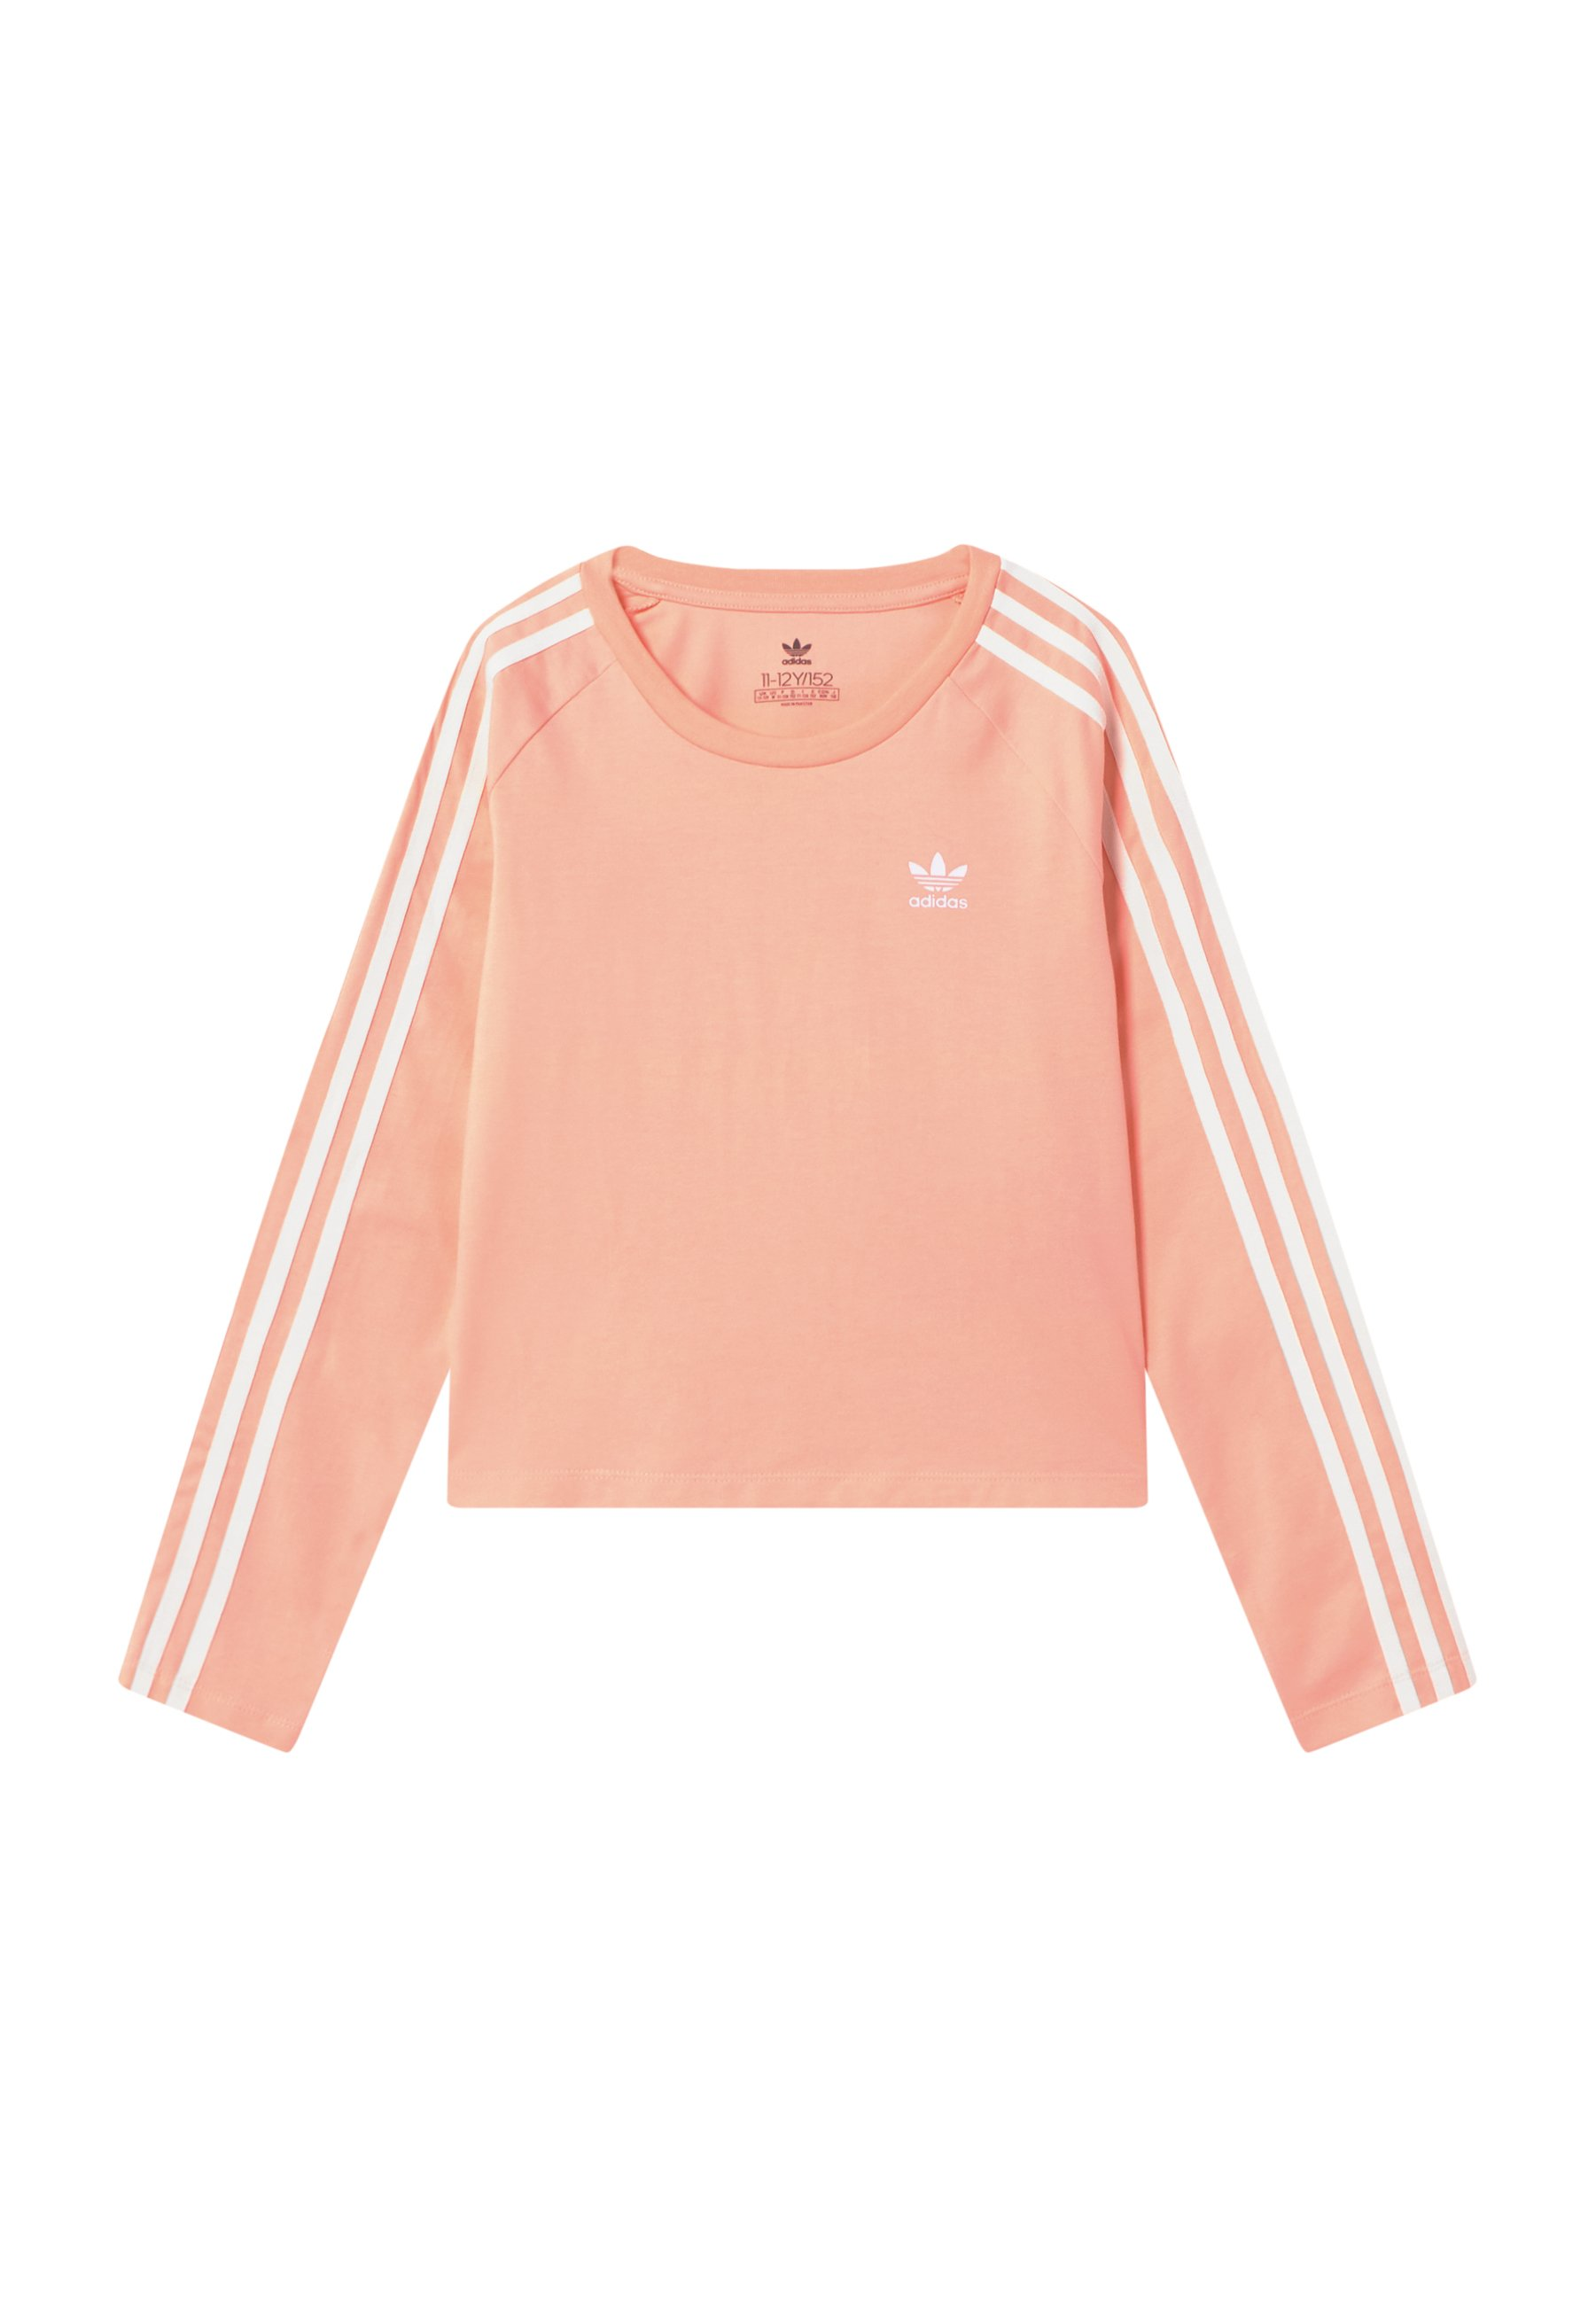 Adidas Originals 3 Stripes - Topper Langermet Hazcor/white